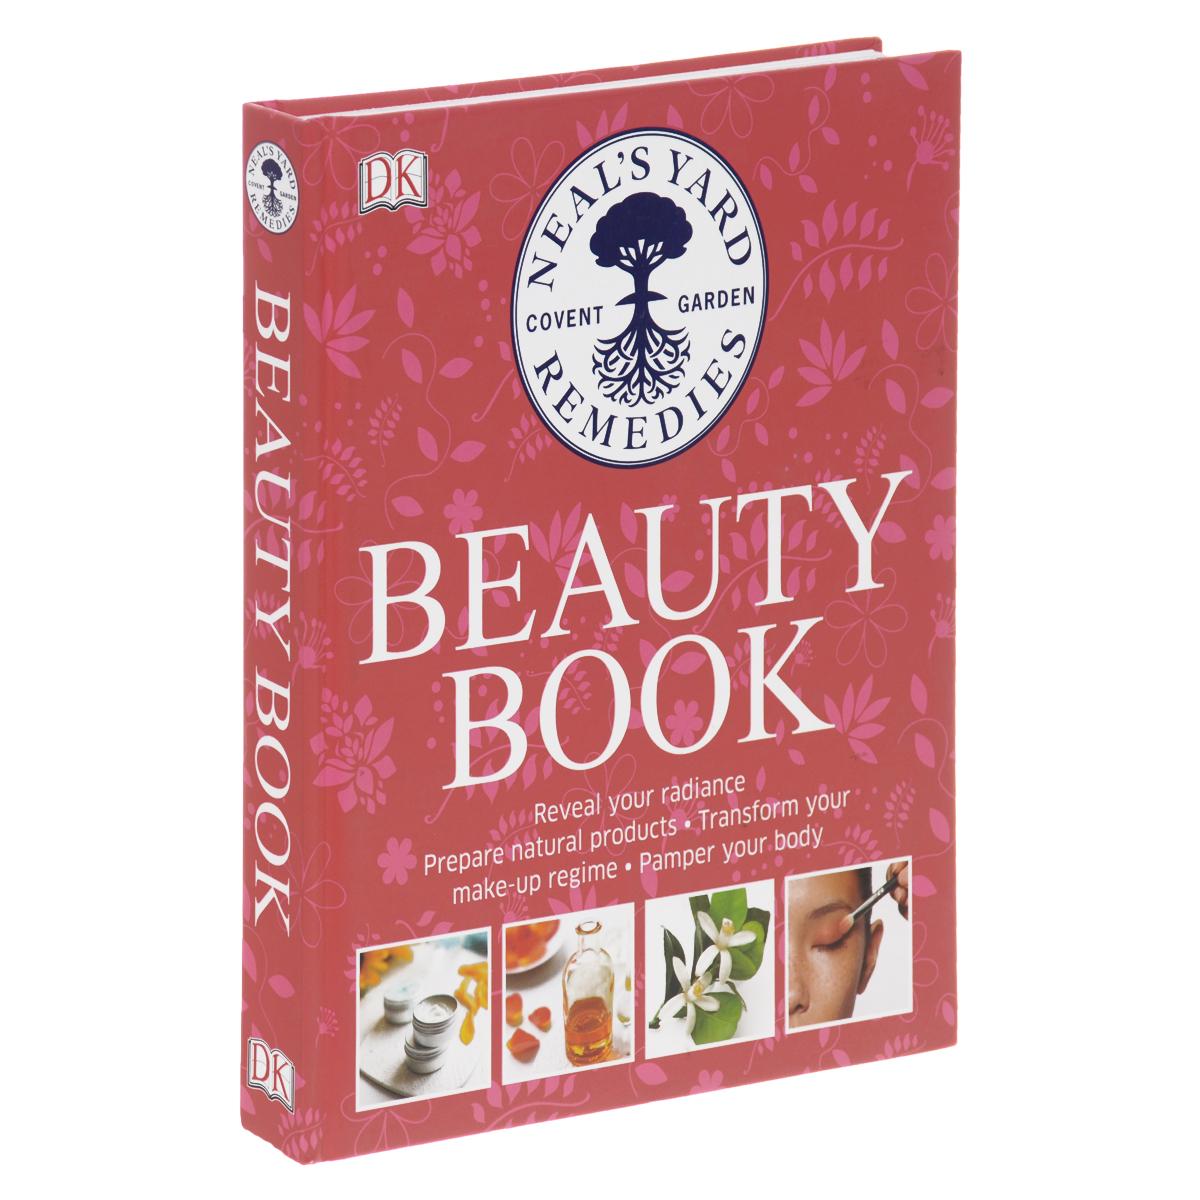 Neal's Yard: Beauty Book